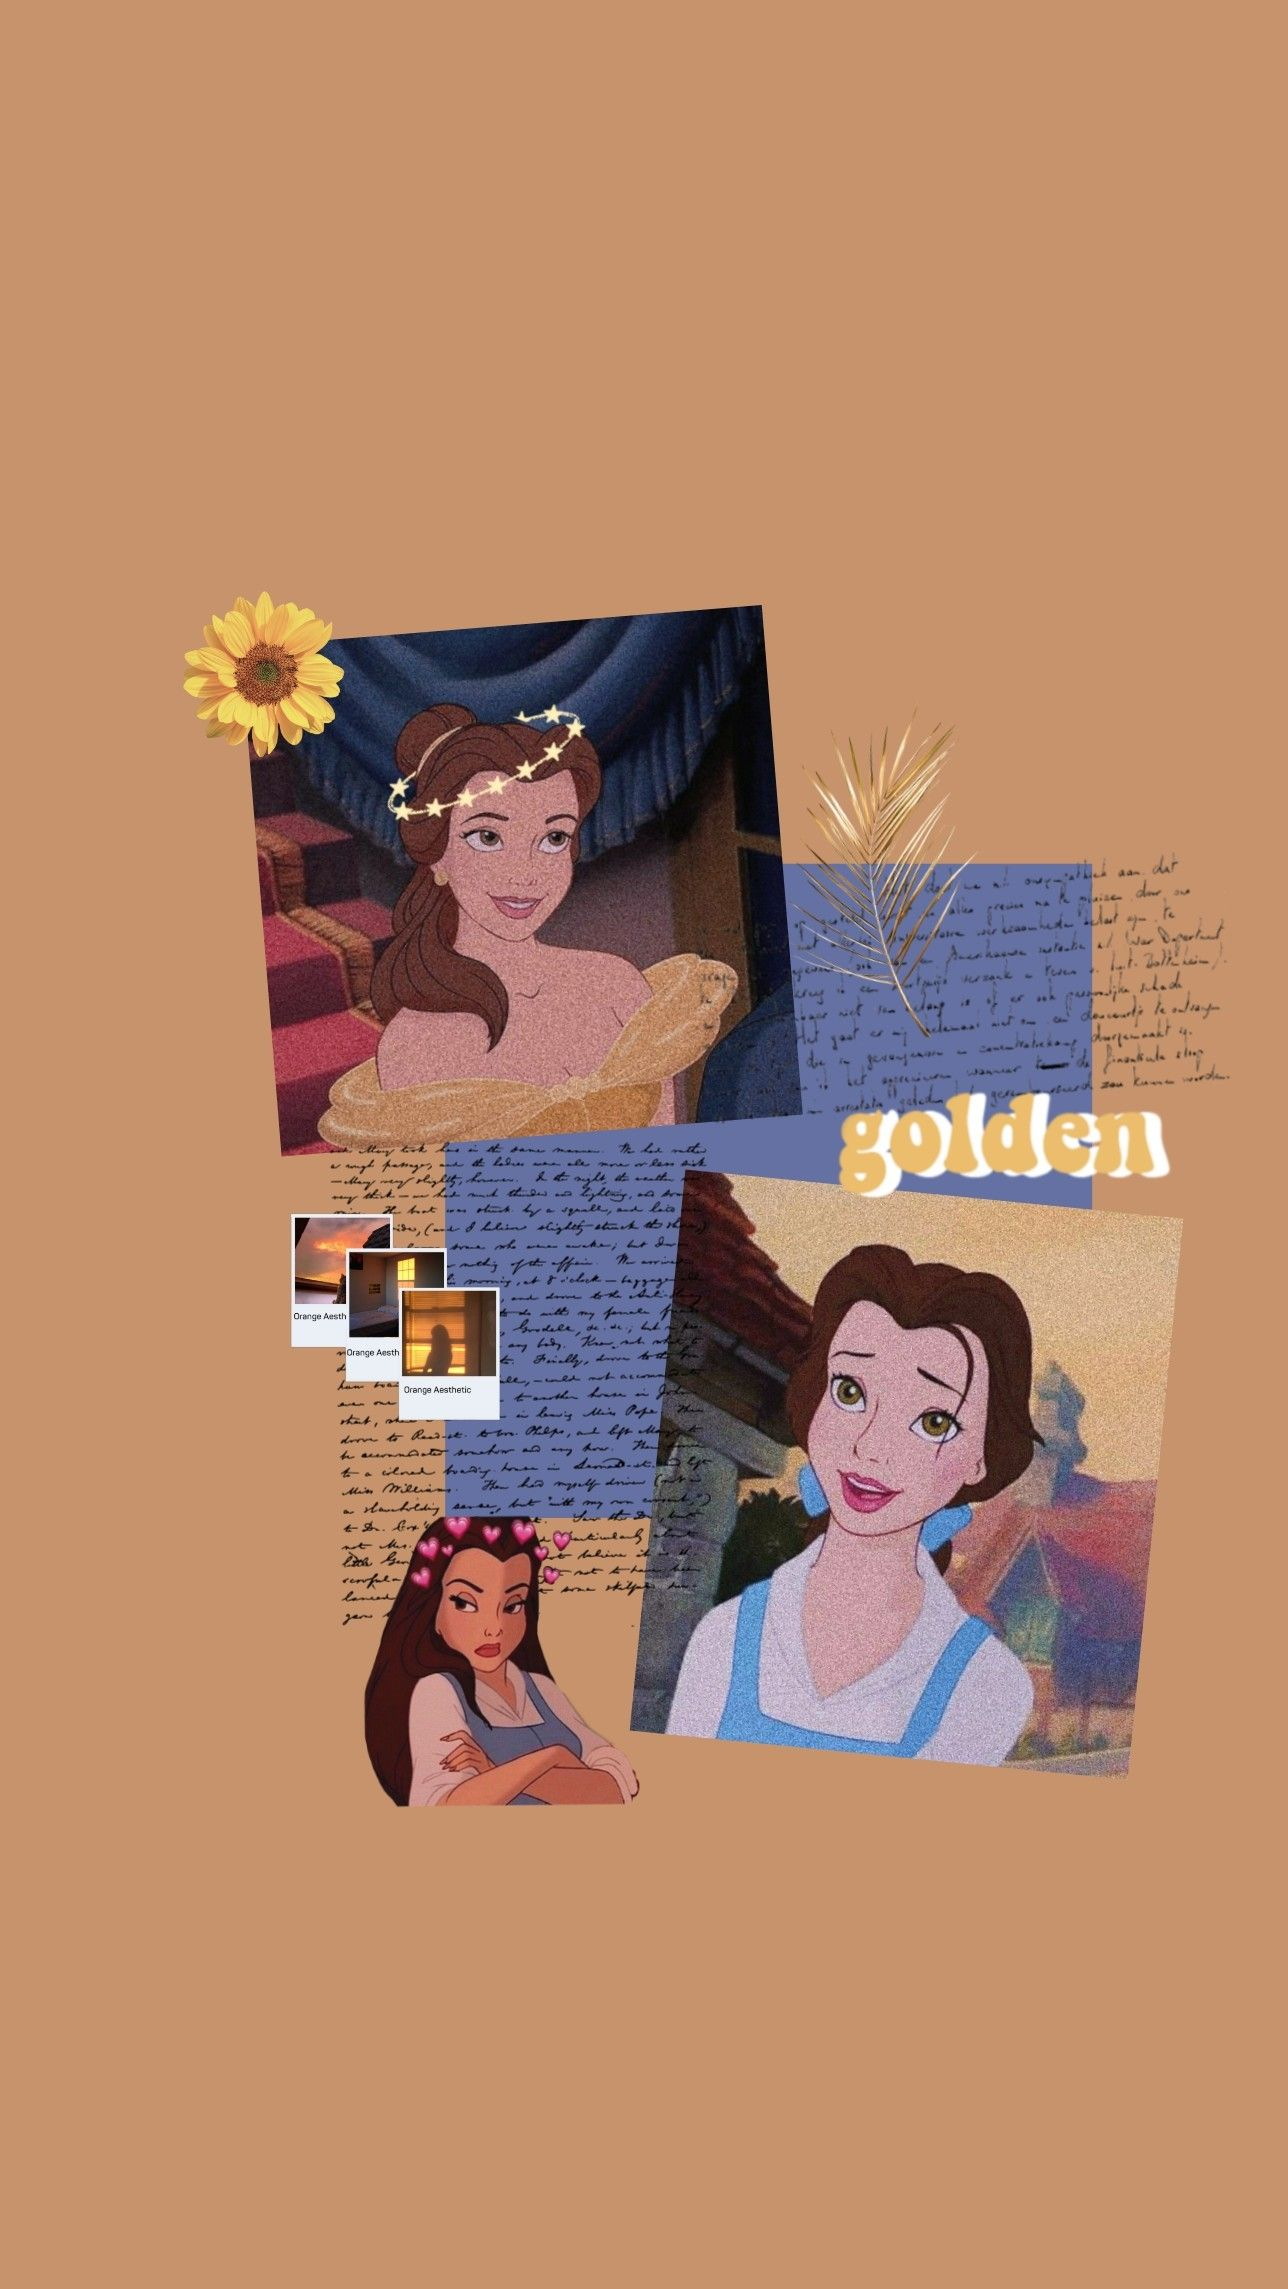 Princess Belle Aesthetic Wallpaper☀️